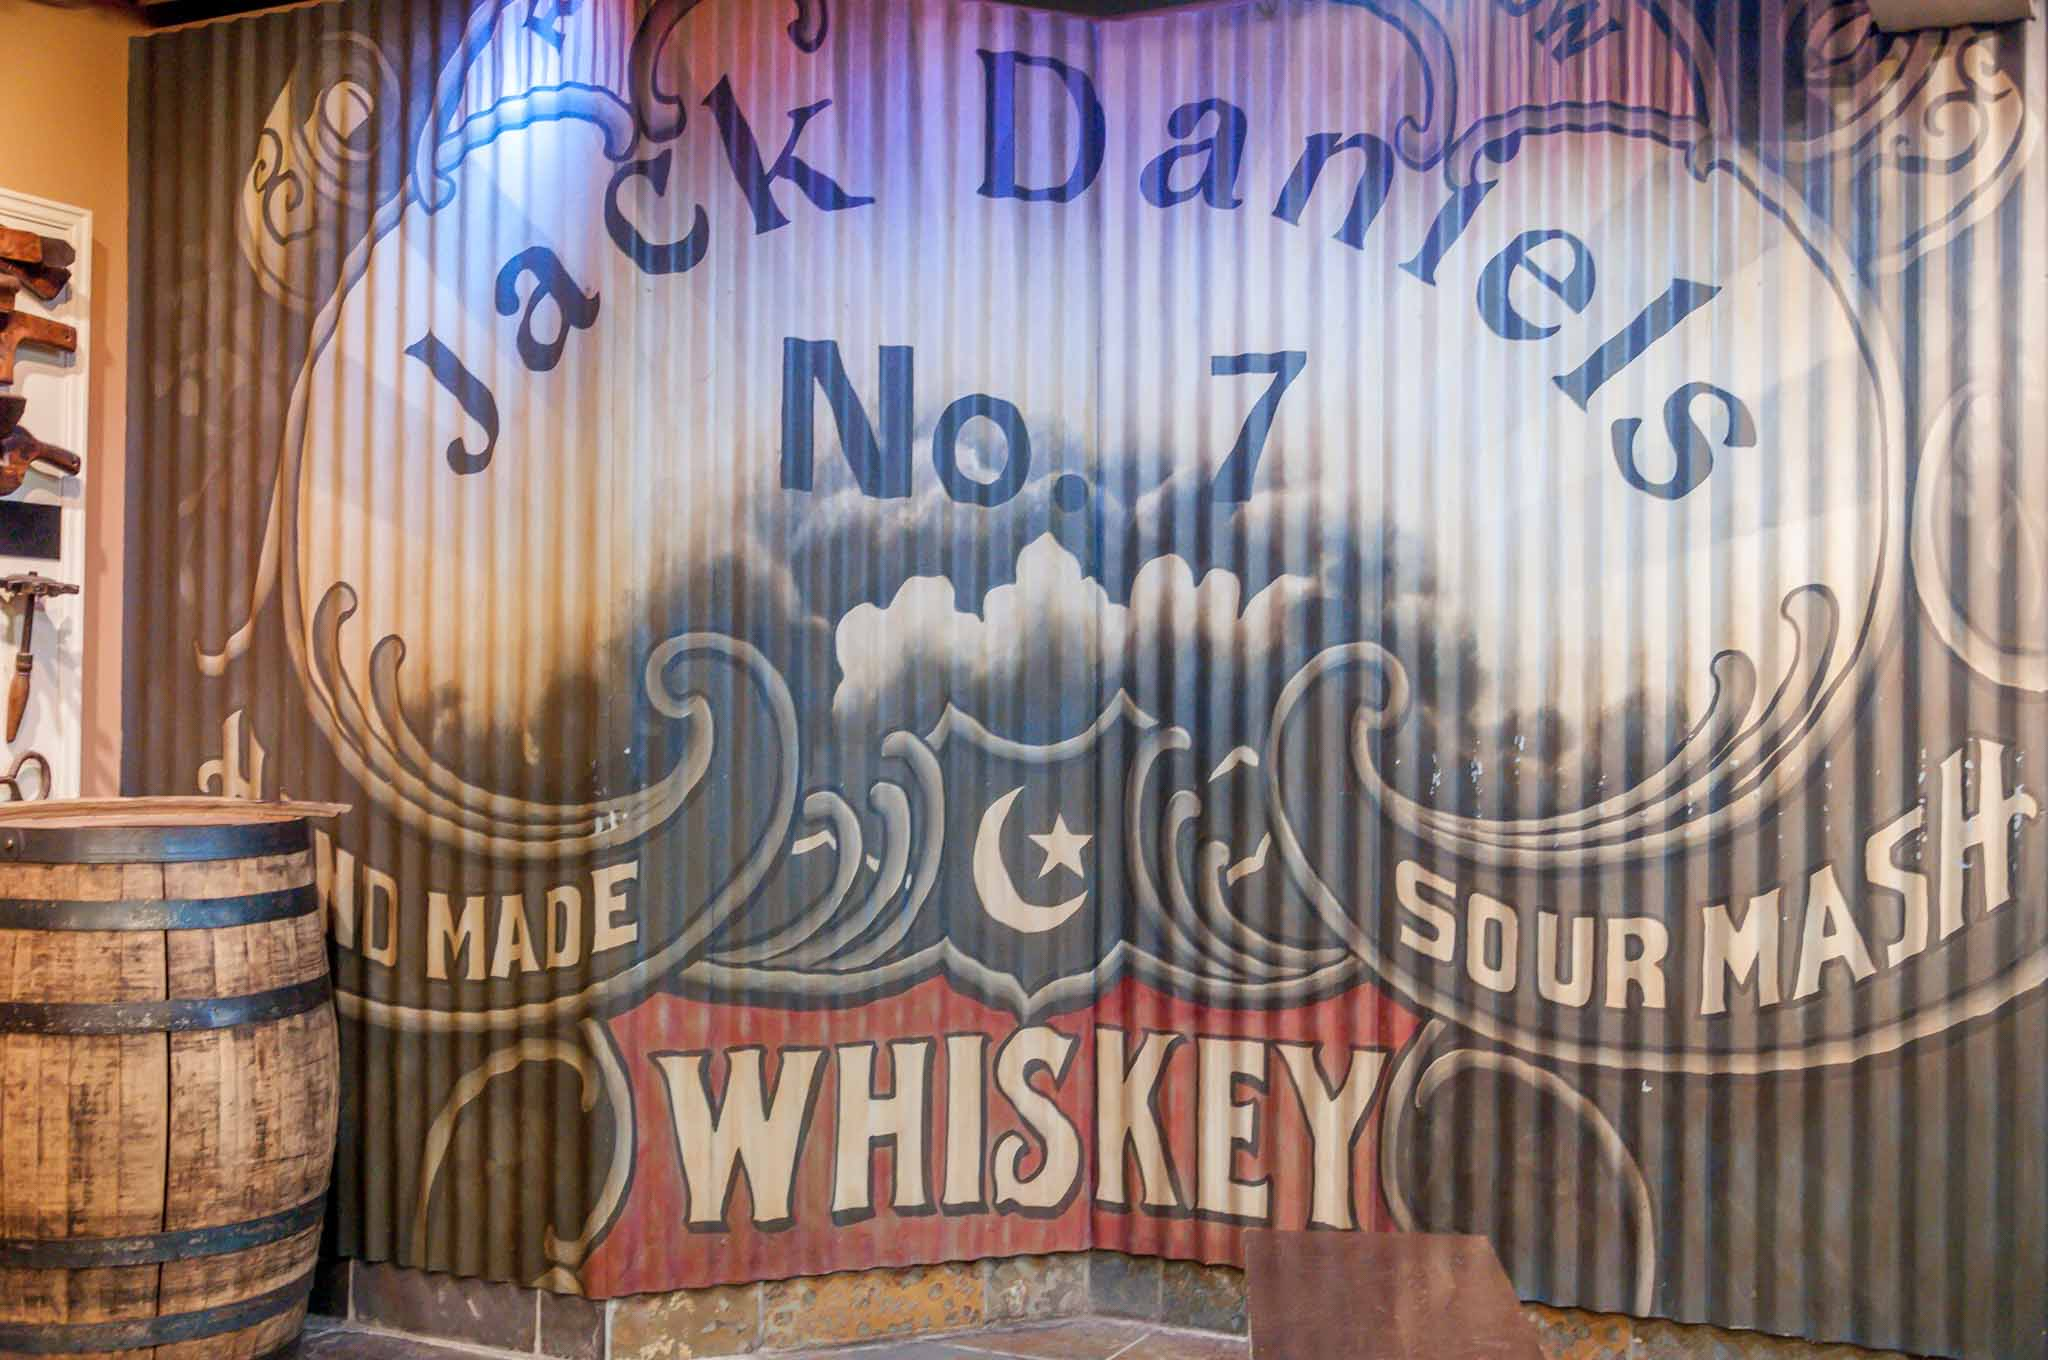 Jack Daniel's No. 7 Whiskey sign